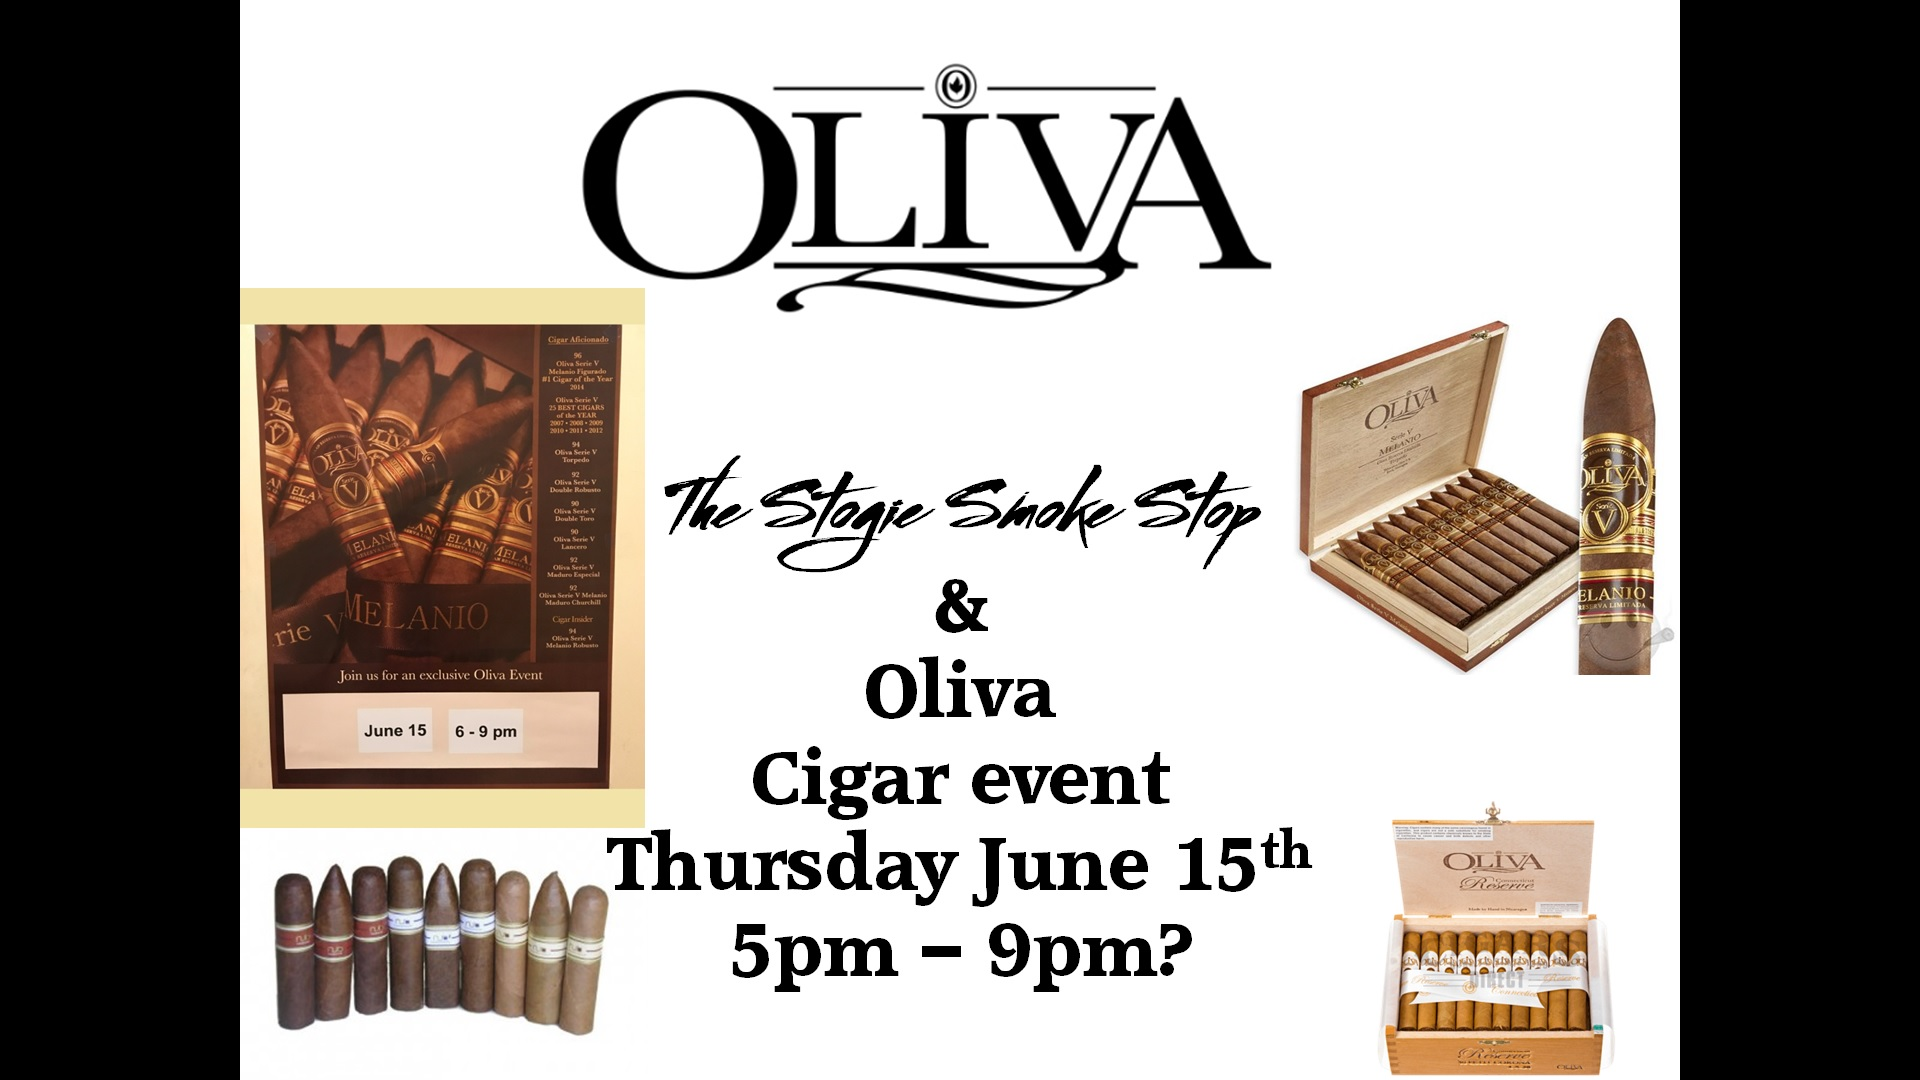 Oliva Cigar Event June 15th 5 - 9 pm